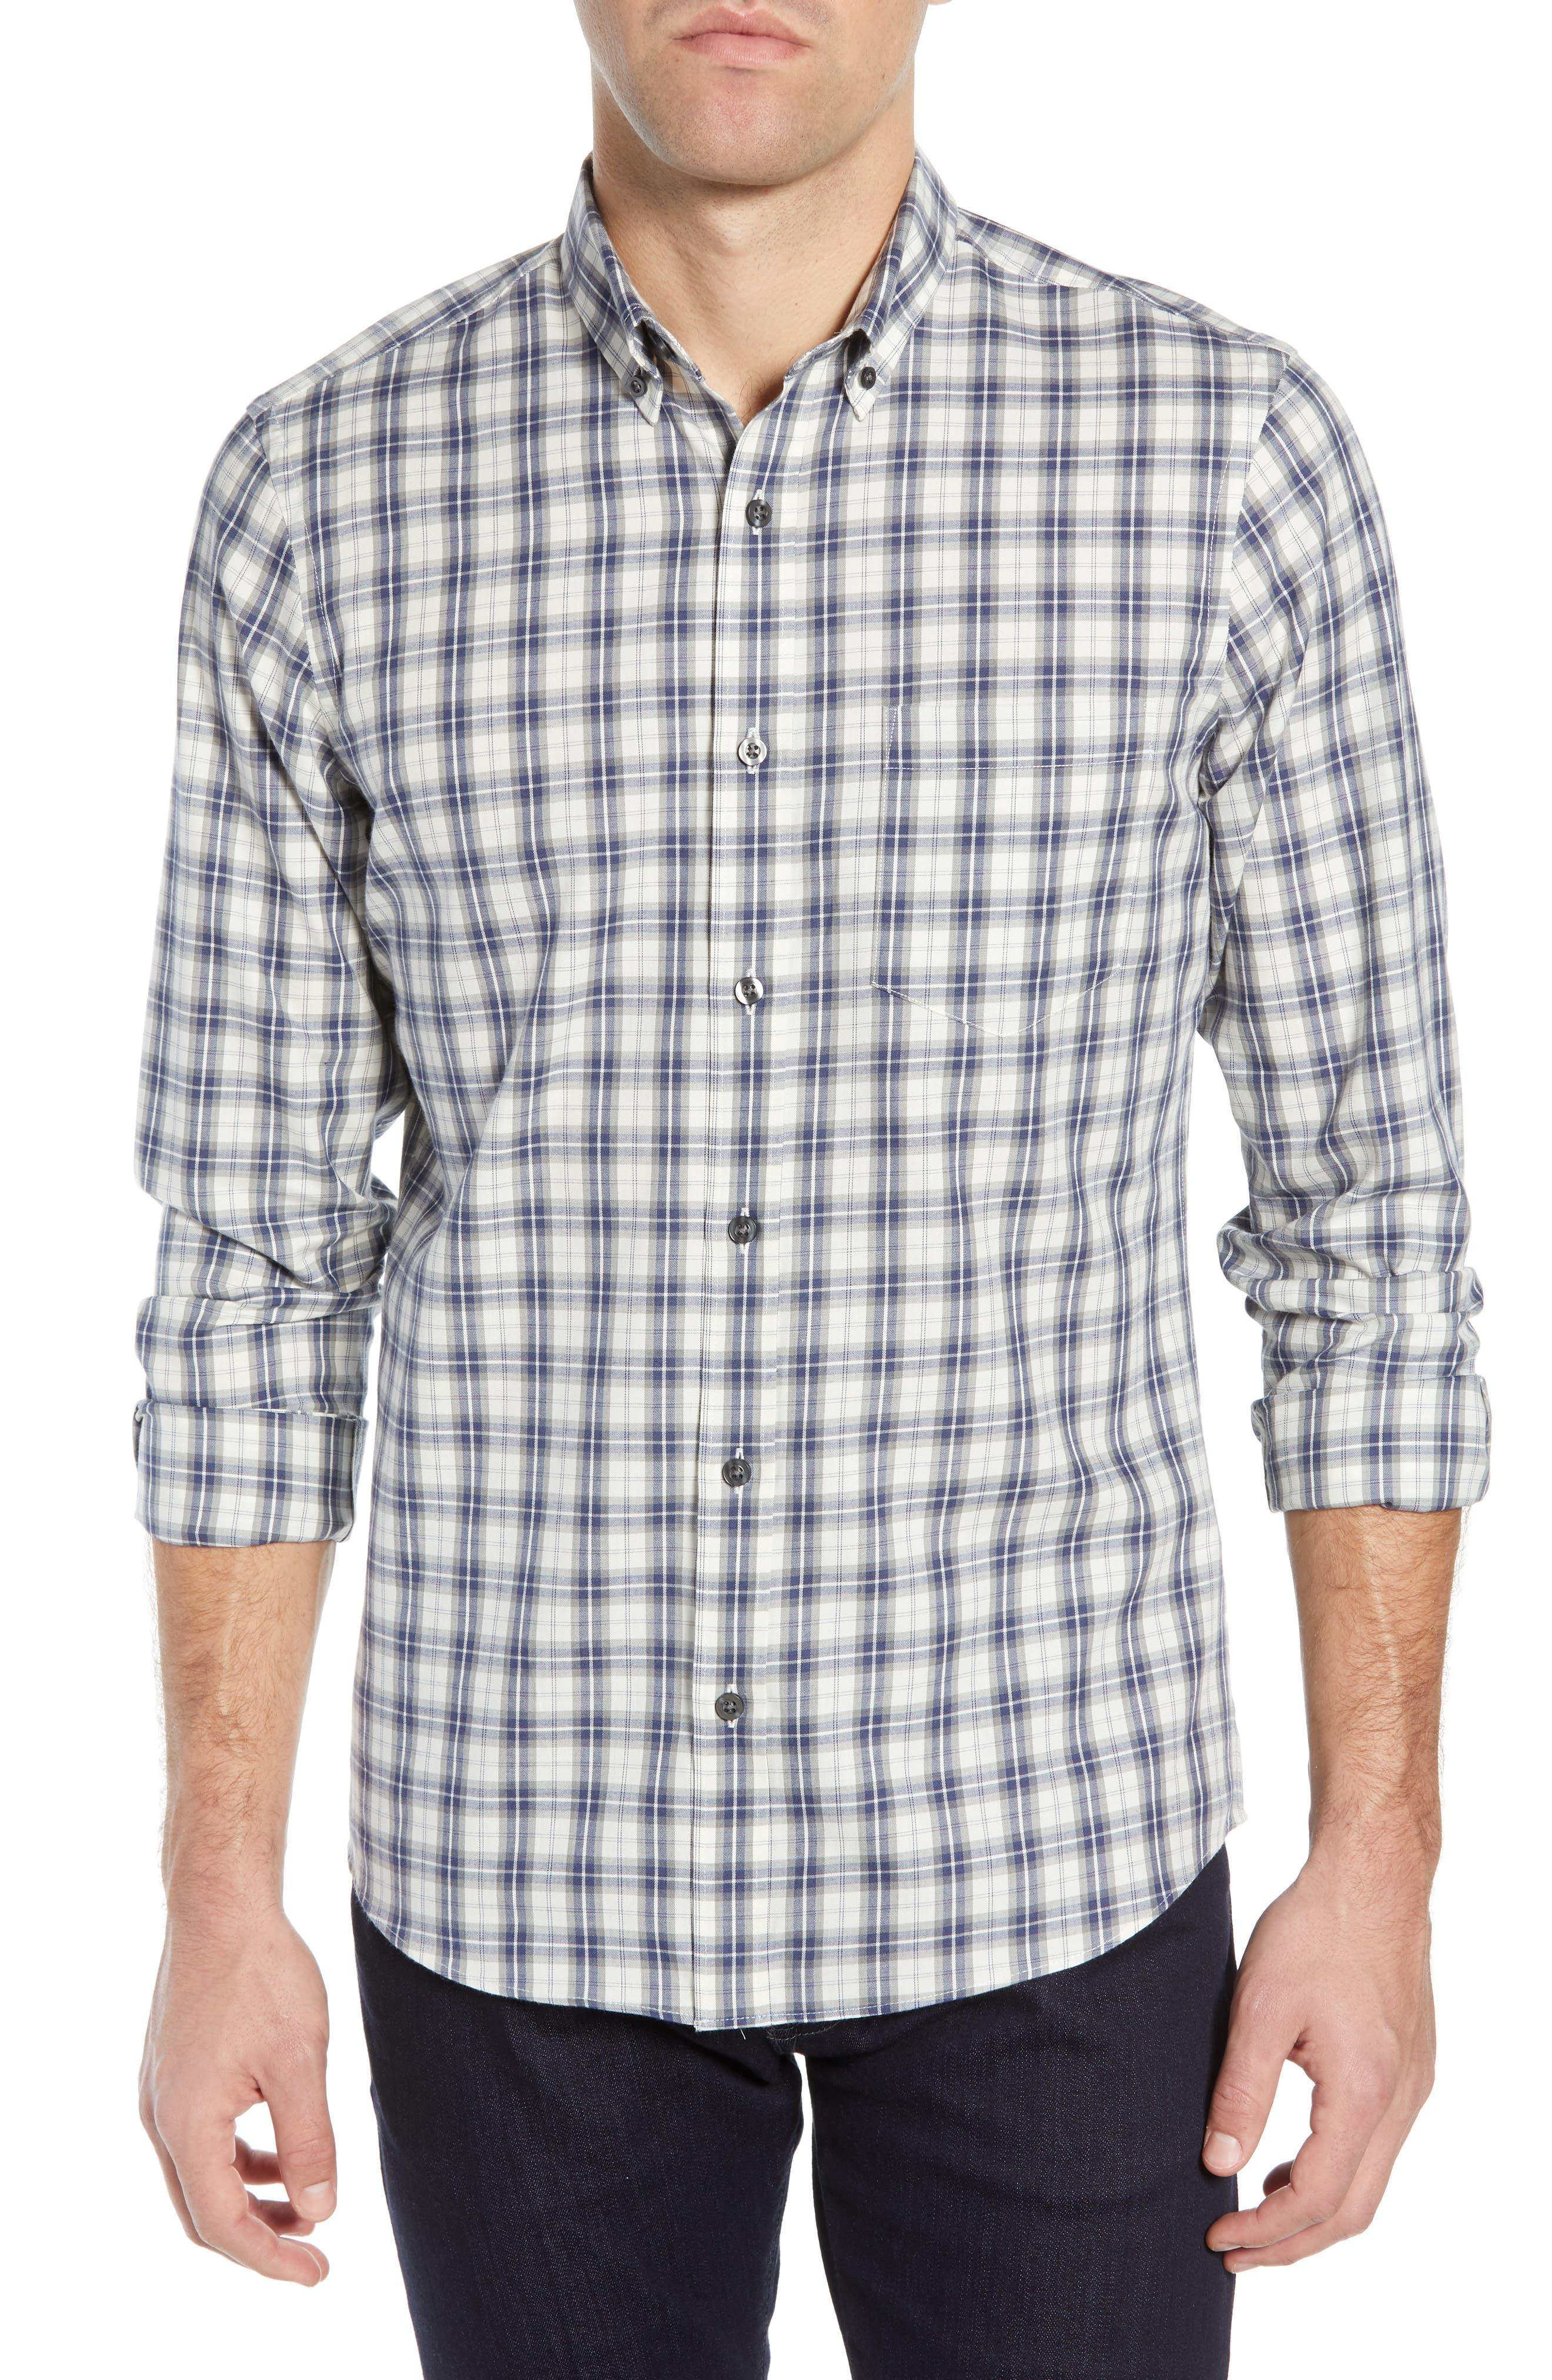 Slim Fit Plaid Sport Shirt, Main, color, WHITE BLUE ENSIGN GREY PLAID